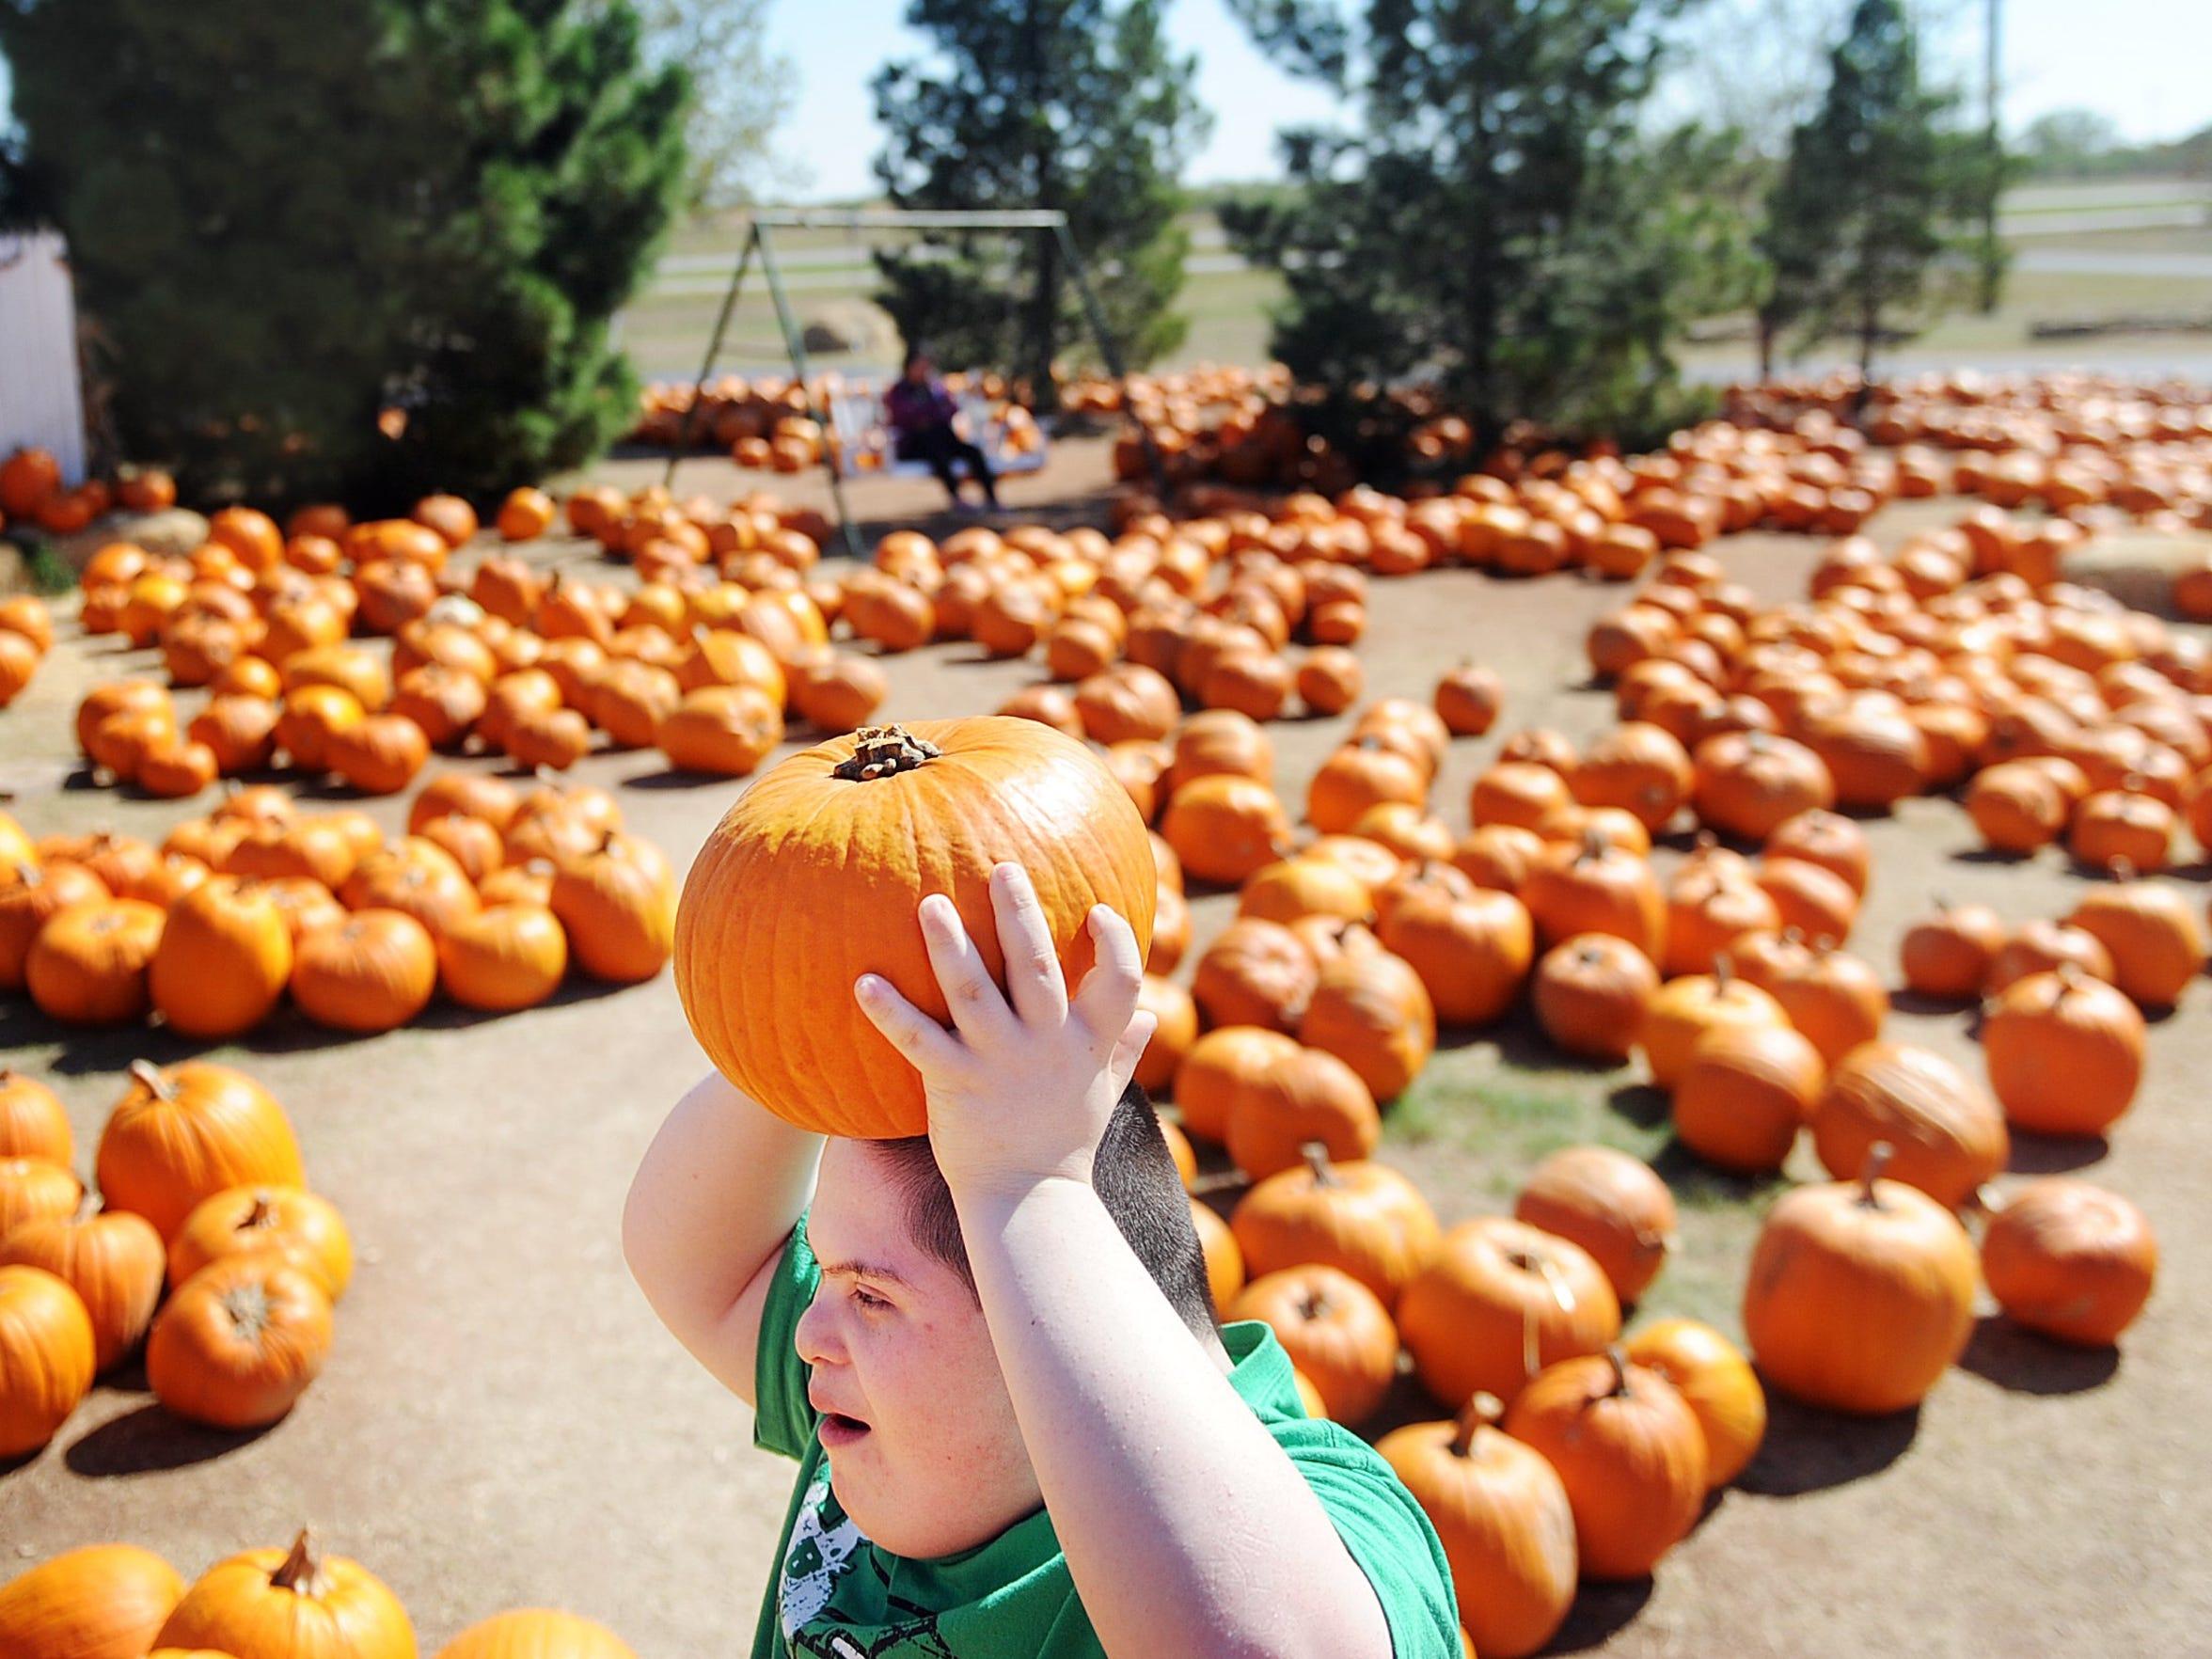 Jesus Arellano,13, totes a pumpkin at the Disability